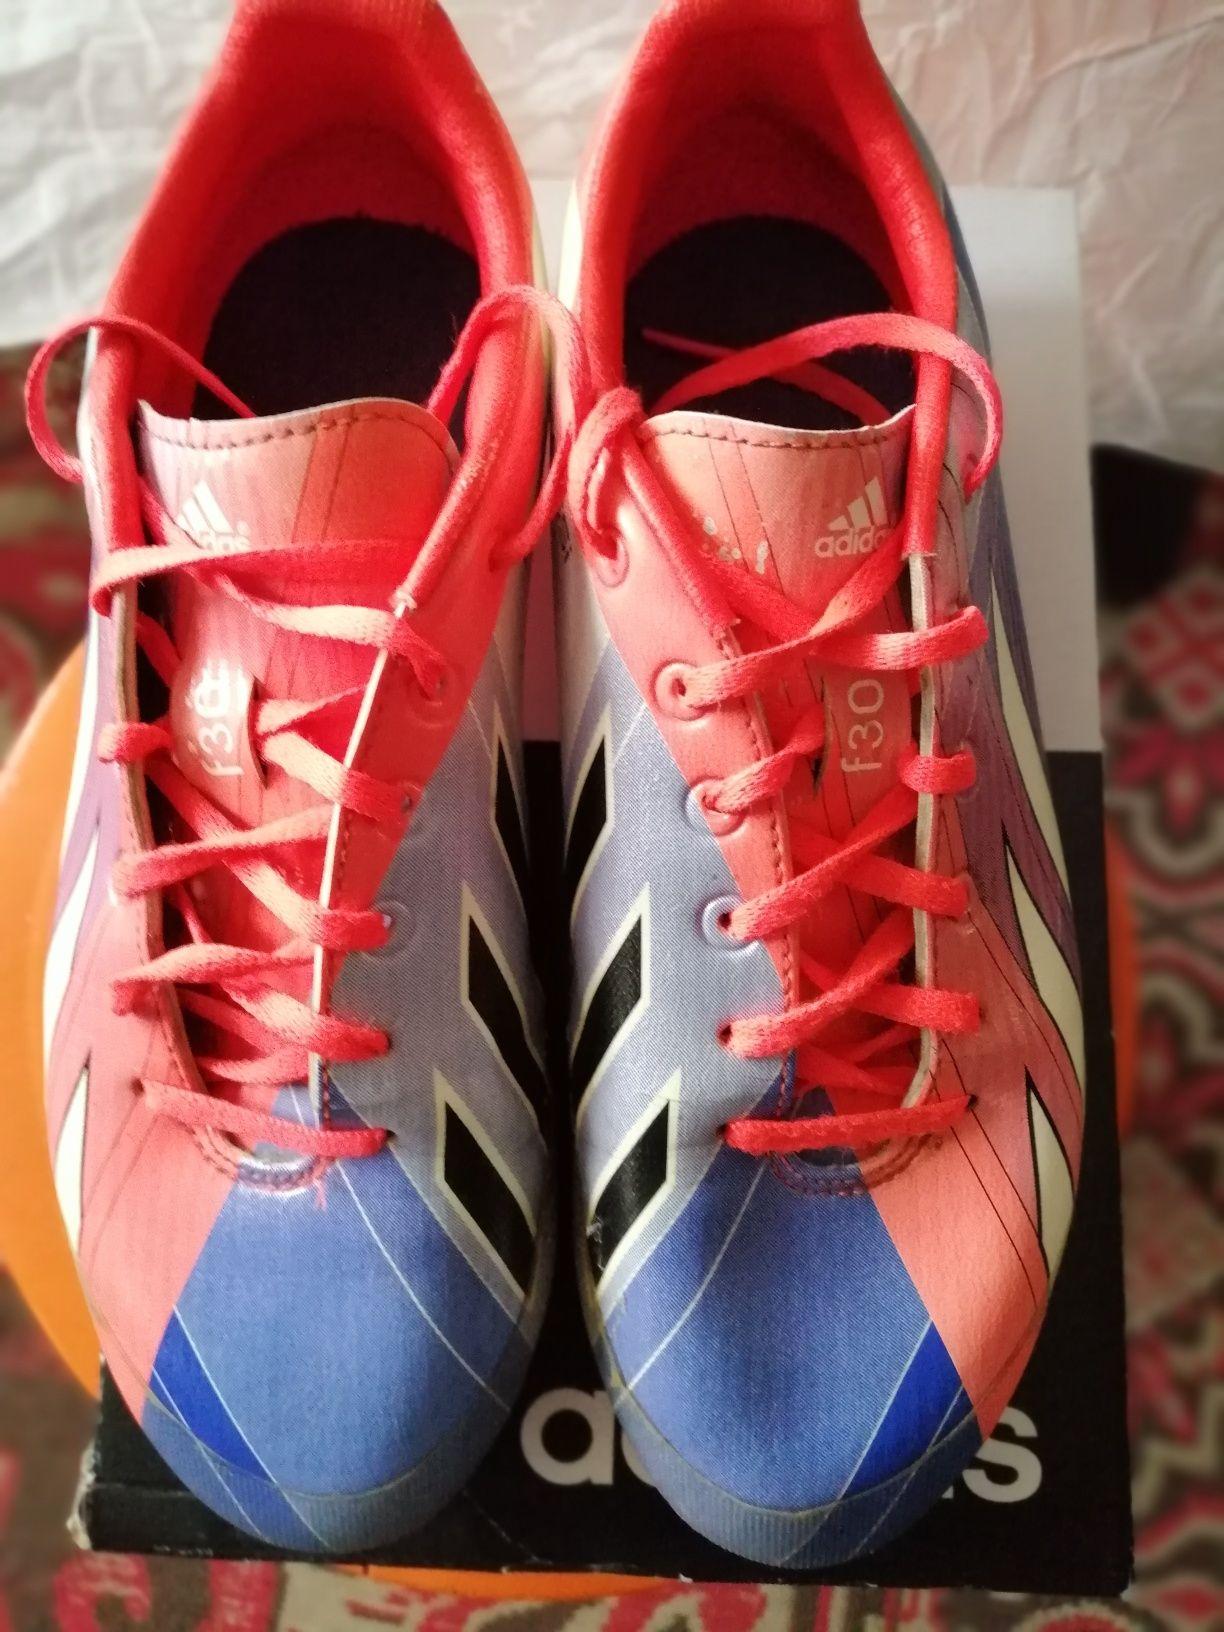 Калеври adidas модел-Messi f30